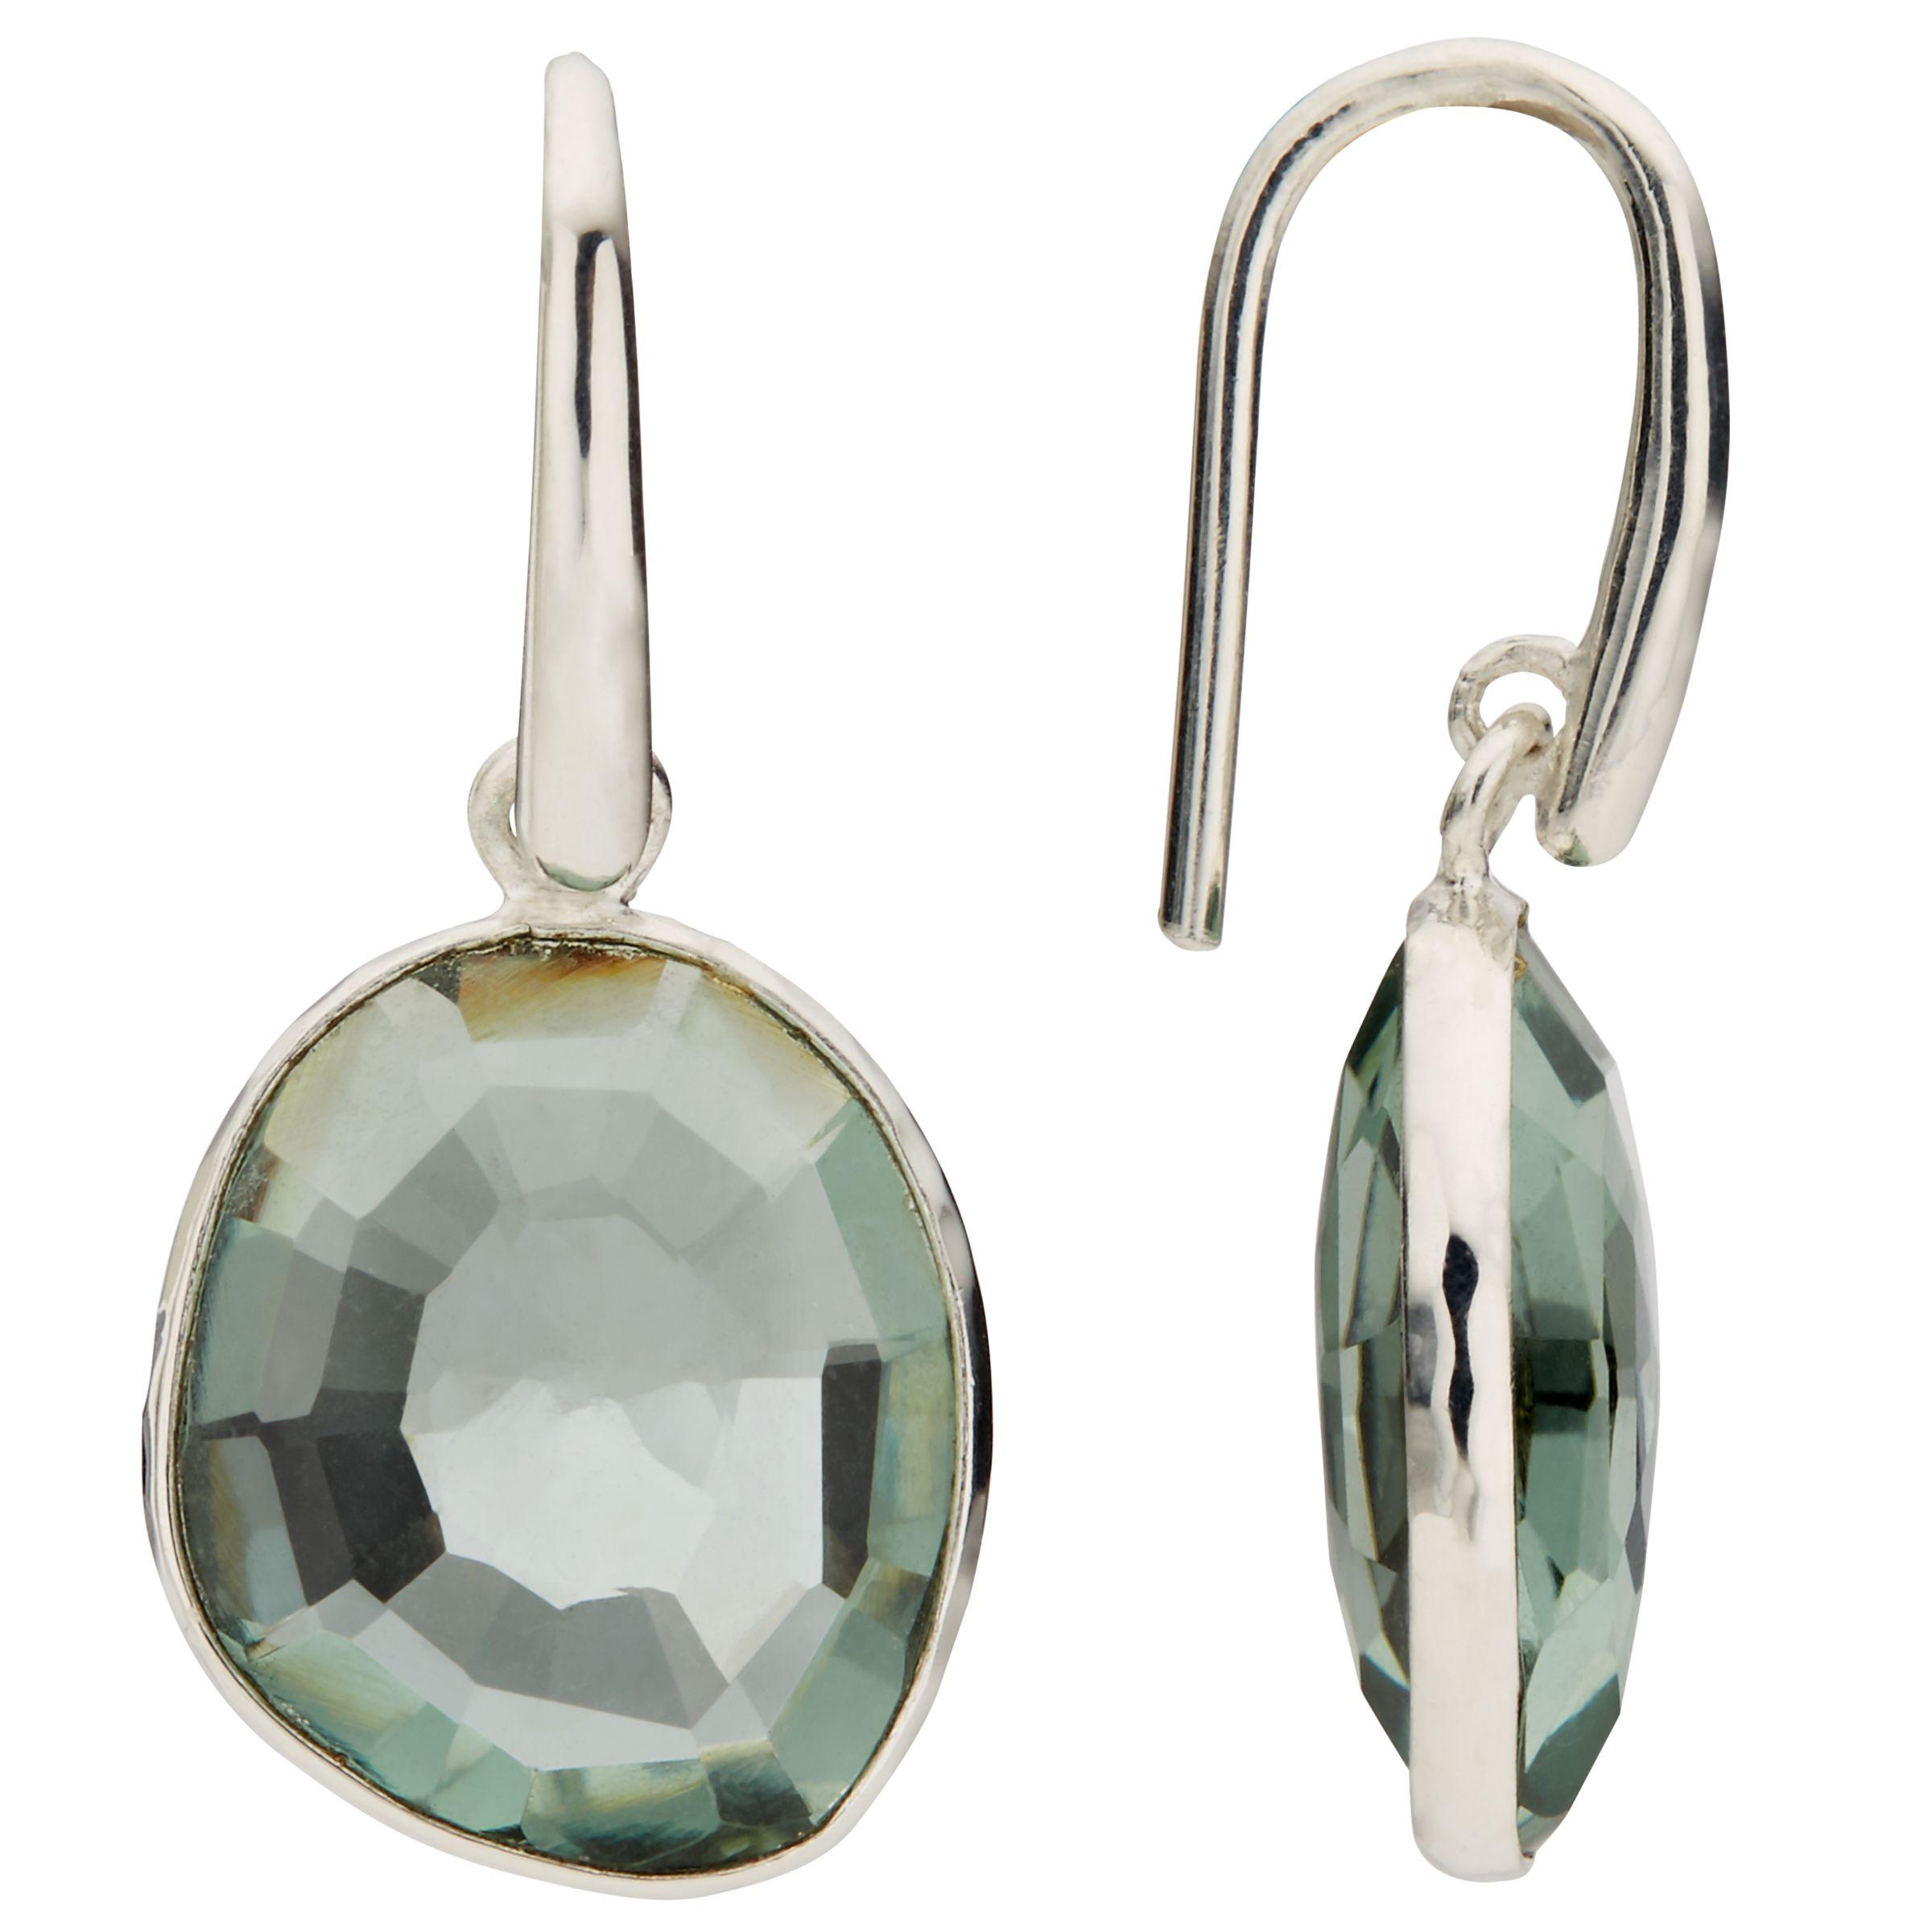 John Lewis Gemstones John Lewis Gemstones Quartz Simple Drop Hook Earrings, Green